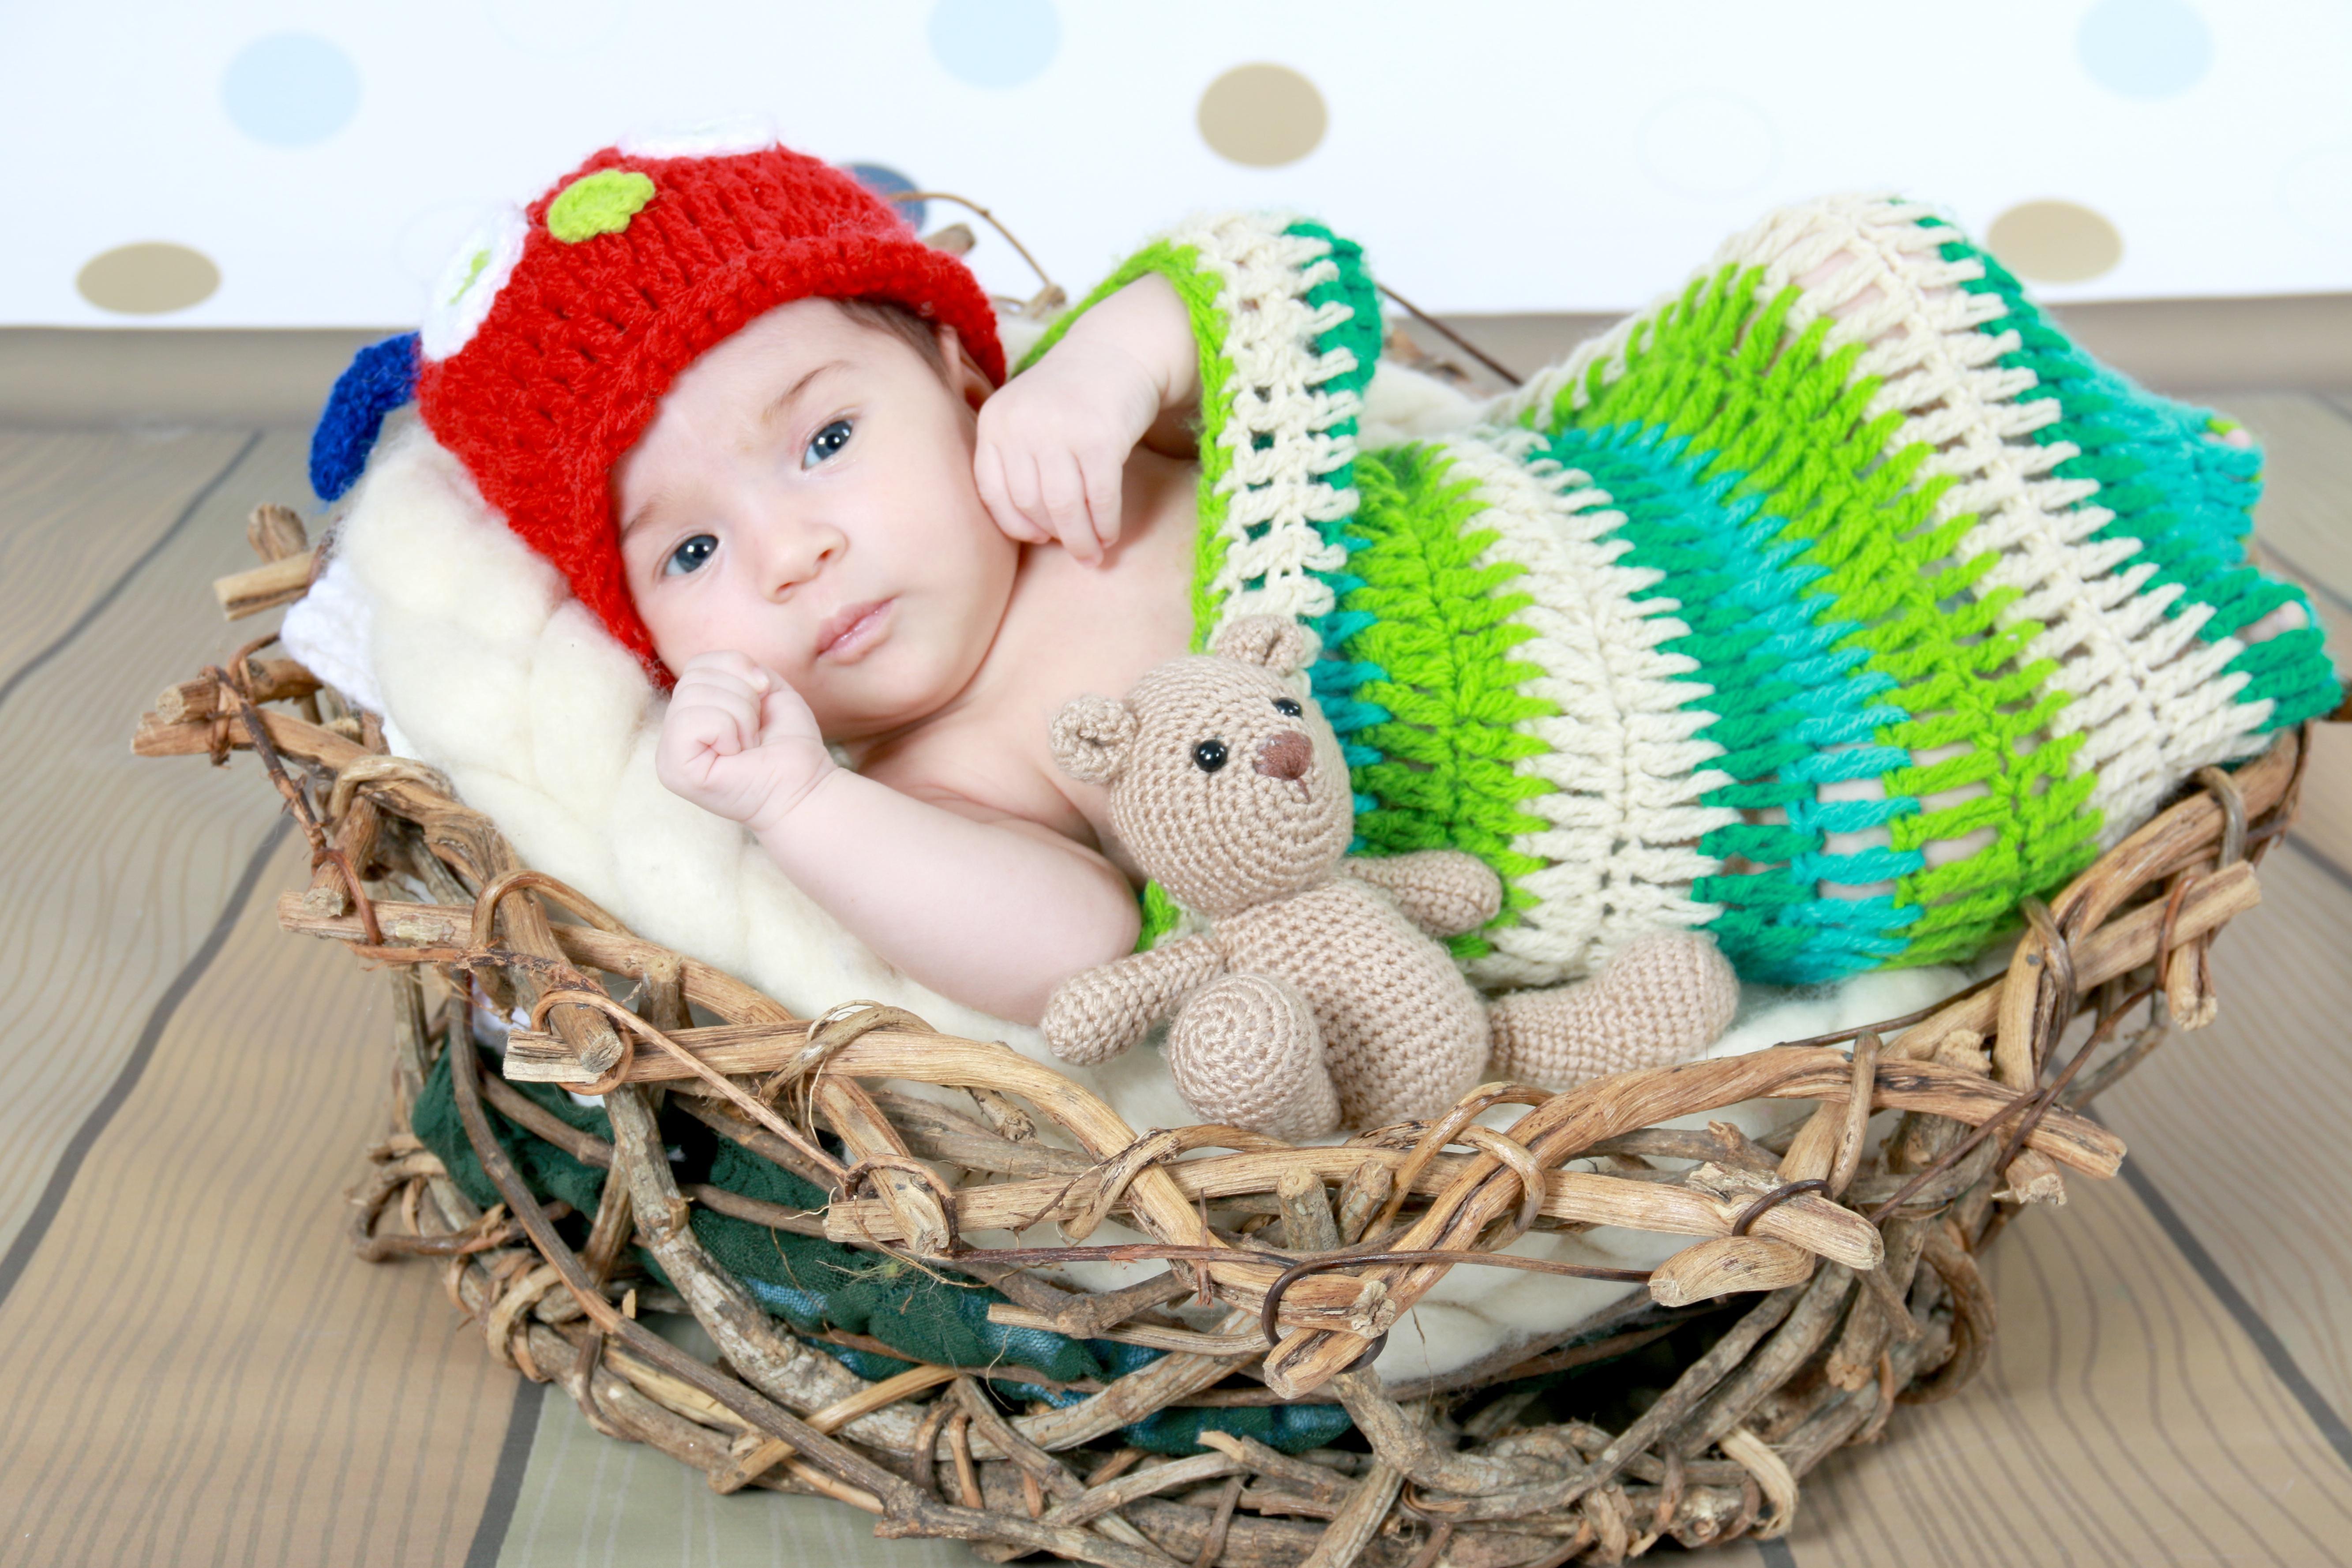 57f726d8f17 girl cute child basket baby headgear wool cradle product crochet infant  toddler princess linda knit cap